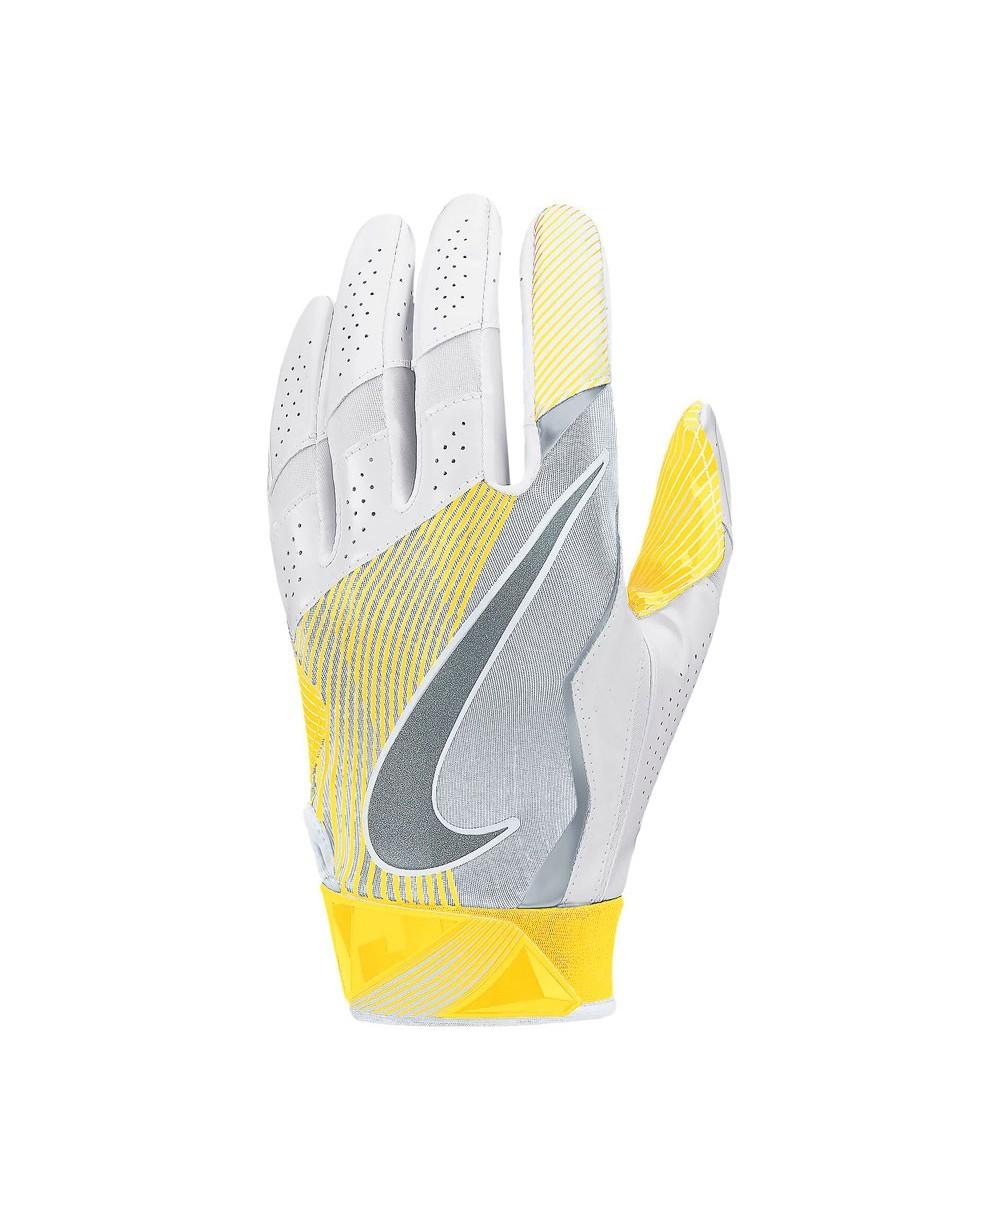 a79200dfabd Vapor Jet 4 Men s American Football Gloves Yellow